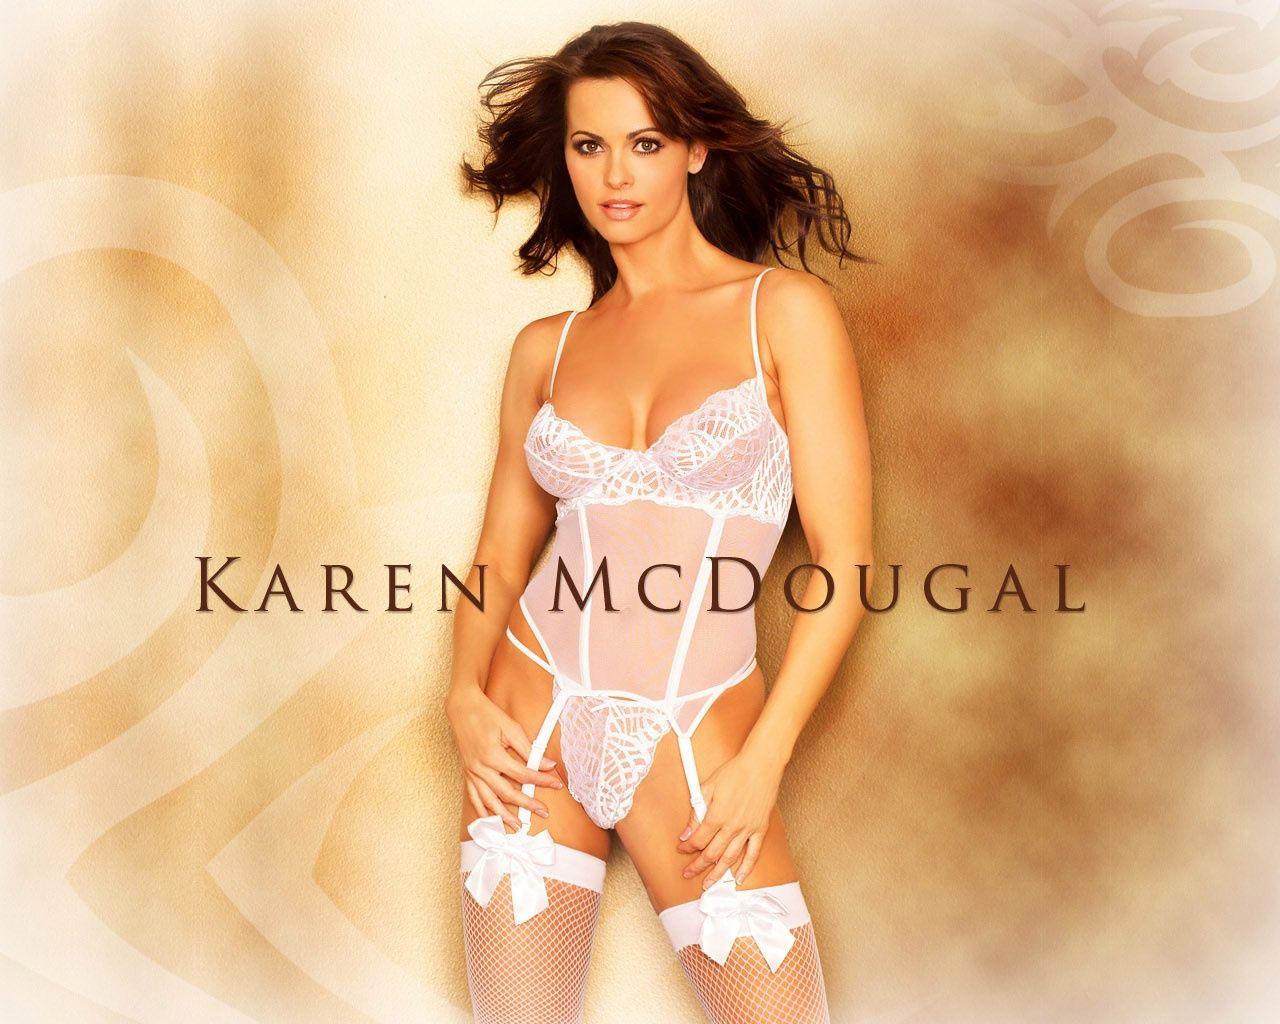 Playboy playmate karen mcdougal nude